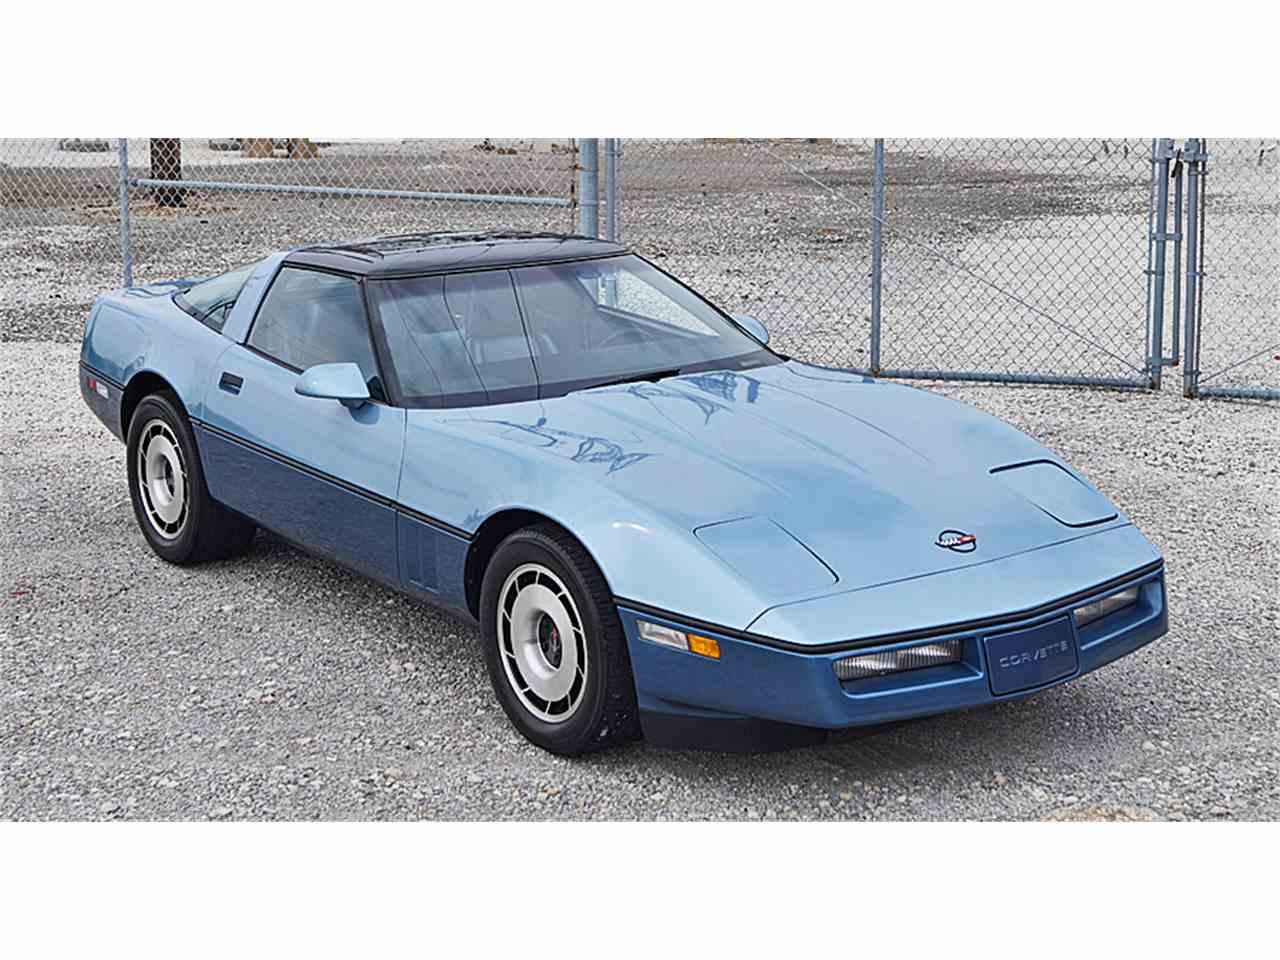 1985 Chevrolet Corvette for Sale - CC-1000392